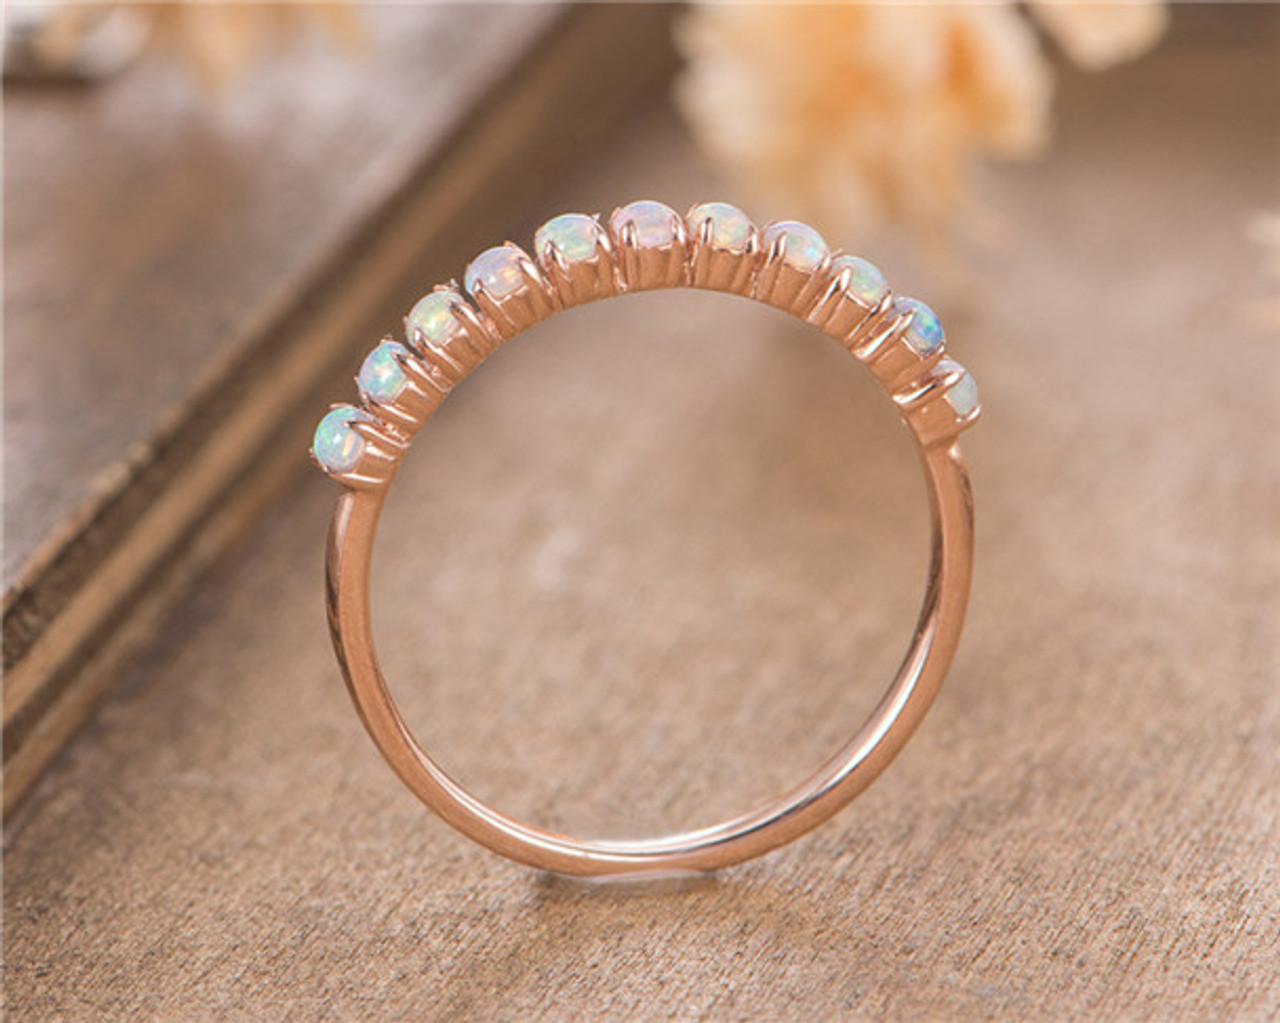 baac8482d411aa Opal Wedding Band 14K Rose Gold October Birthstone Stacking Matching Bridal Anniversary  Gift